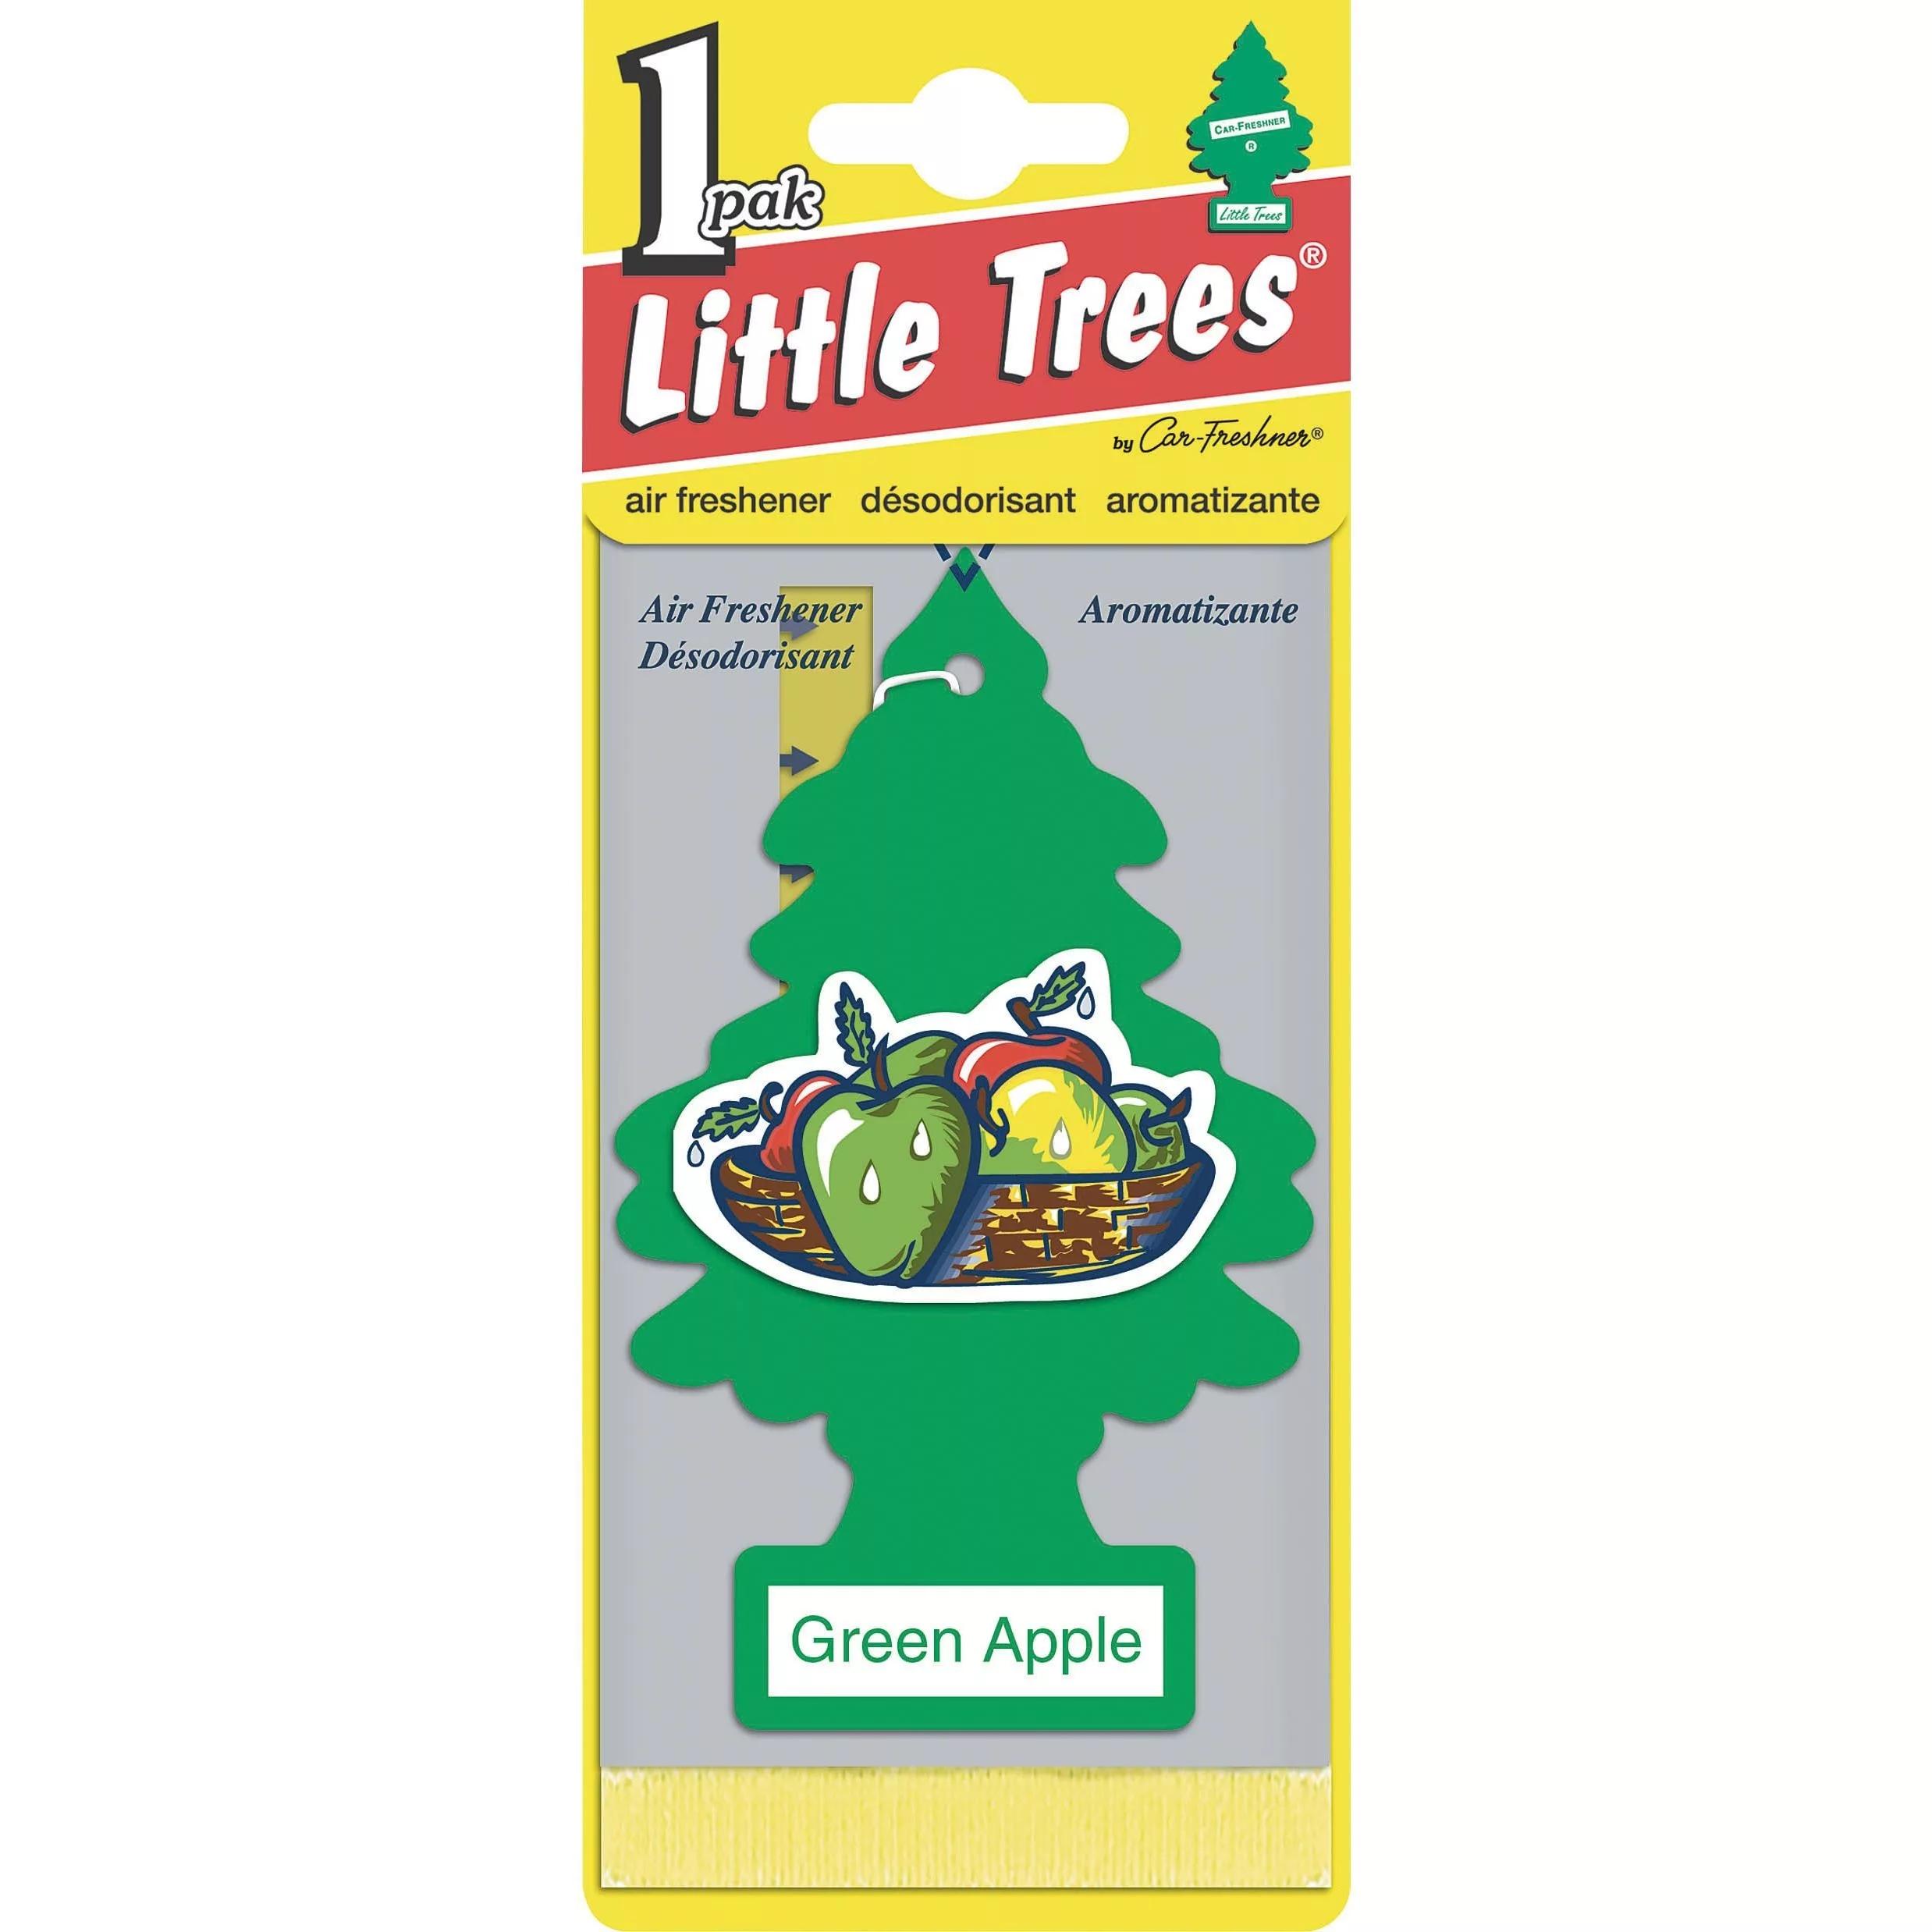 Автомобильный ароматизатор Car-Freshner Little Trees, зеленое яблоко, США ароматизатор car freshner mixed naturals лайм с лимоном